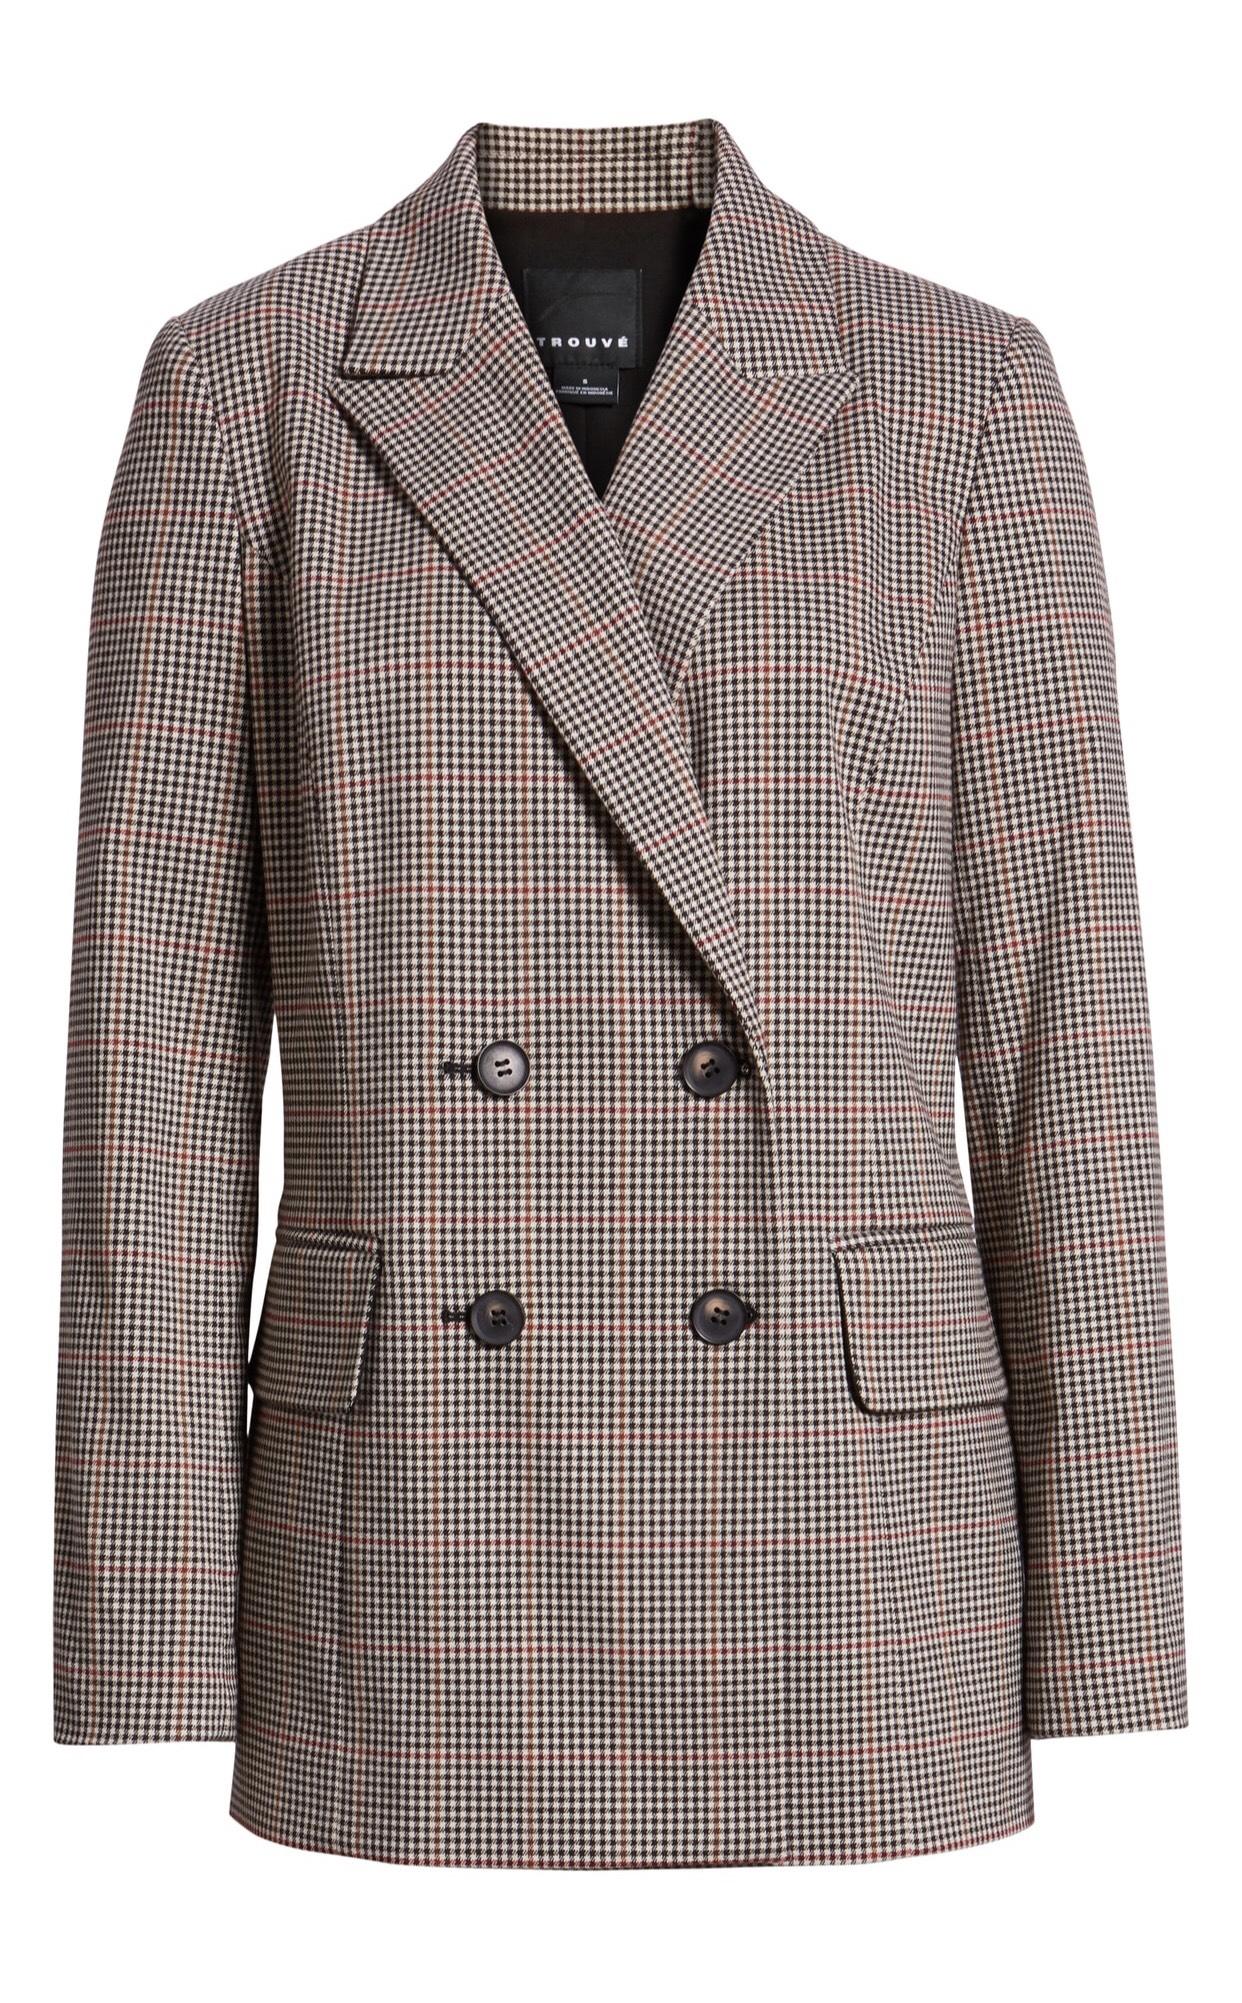 Trouvé Menswear Blazer {$99.90} - After sale: $149